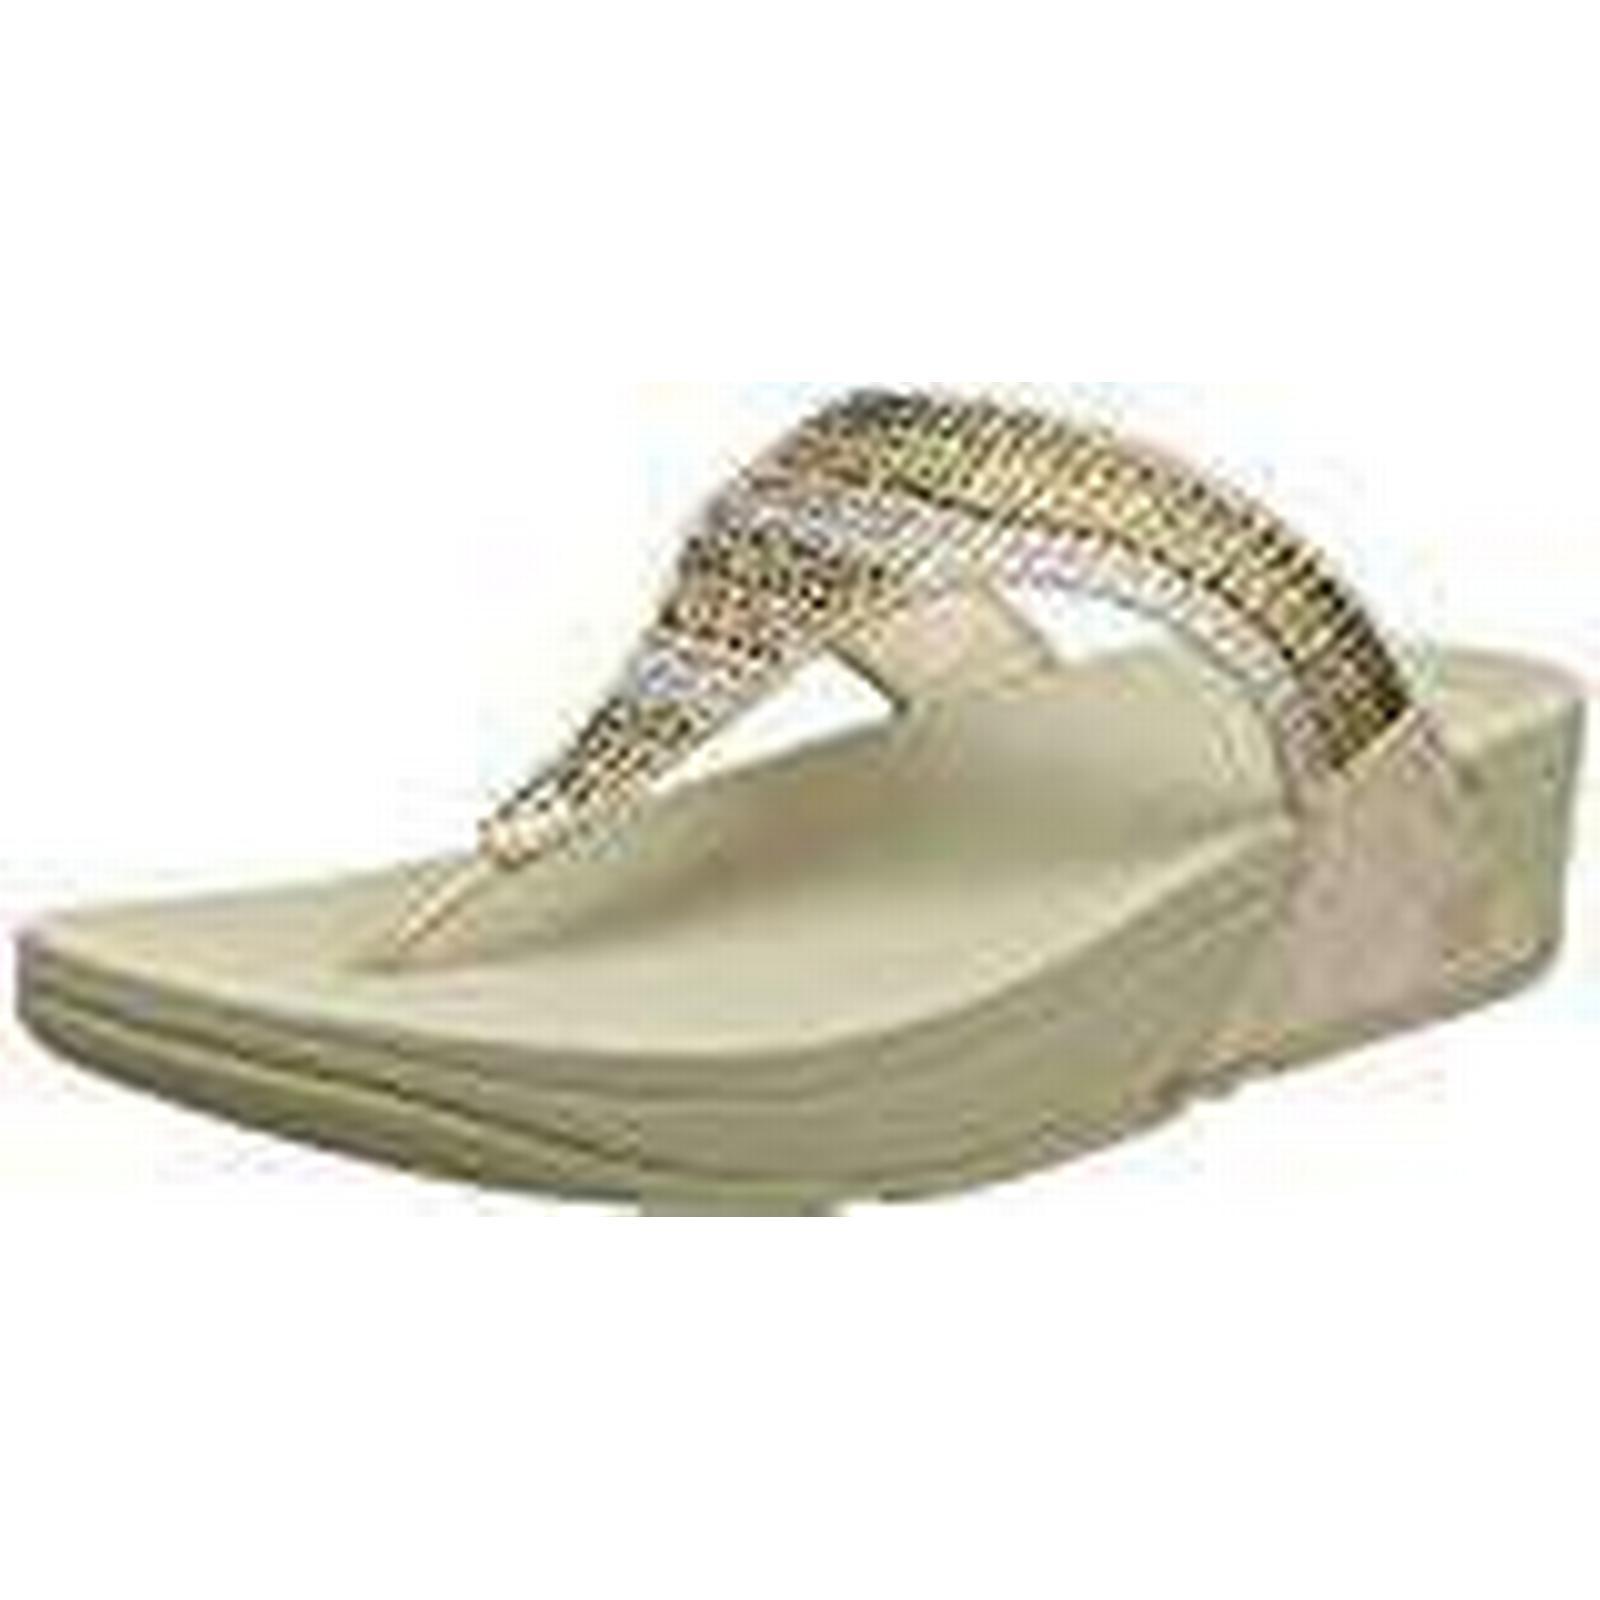 Fitflop Women's Strobe Luxe Toe-Thong UK Sandals Open (Gold), 6.5 UK Toe-Thong 40 EU 06efb2